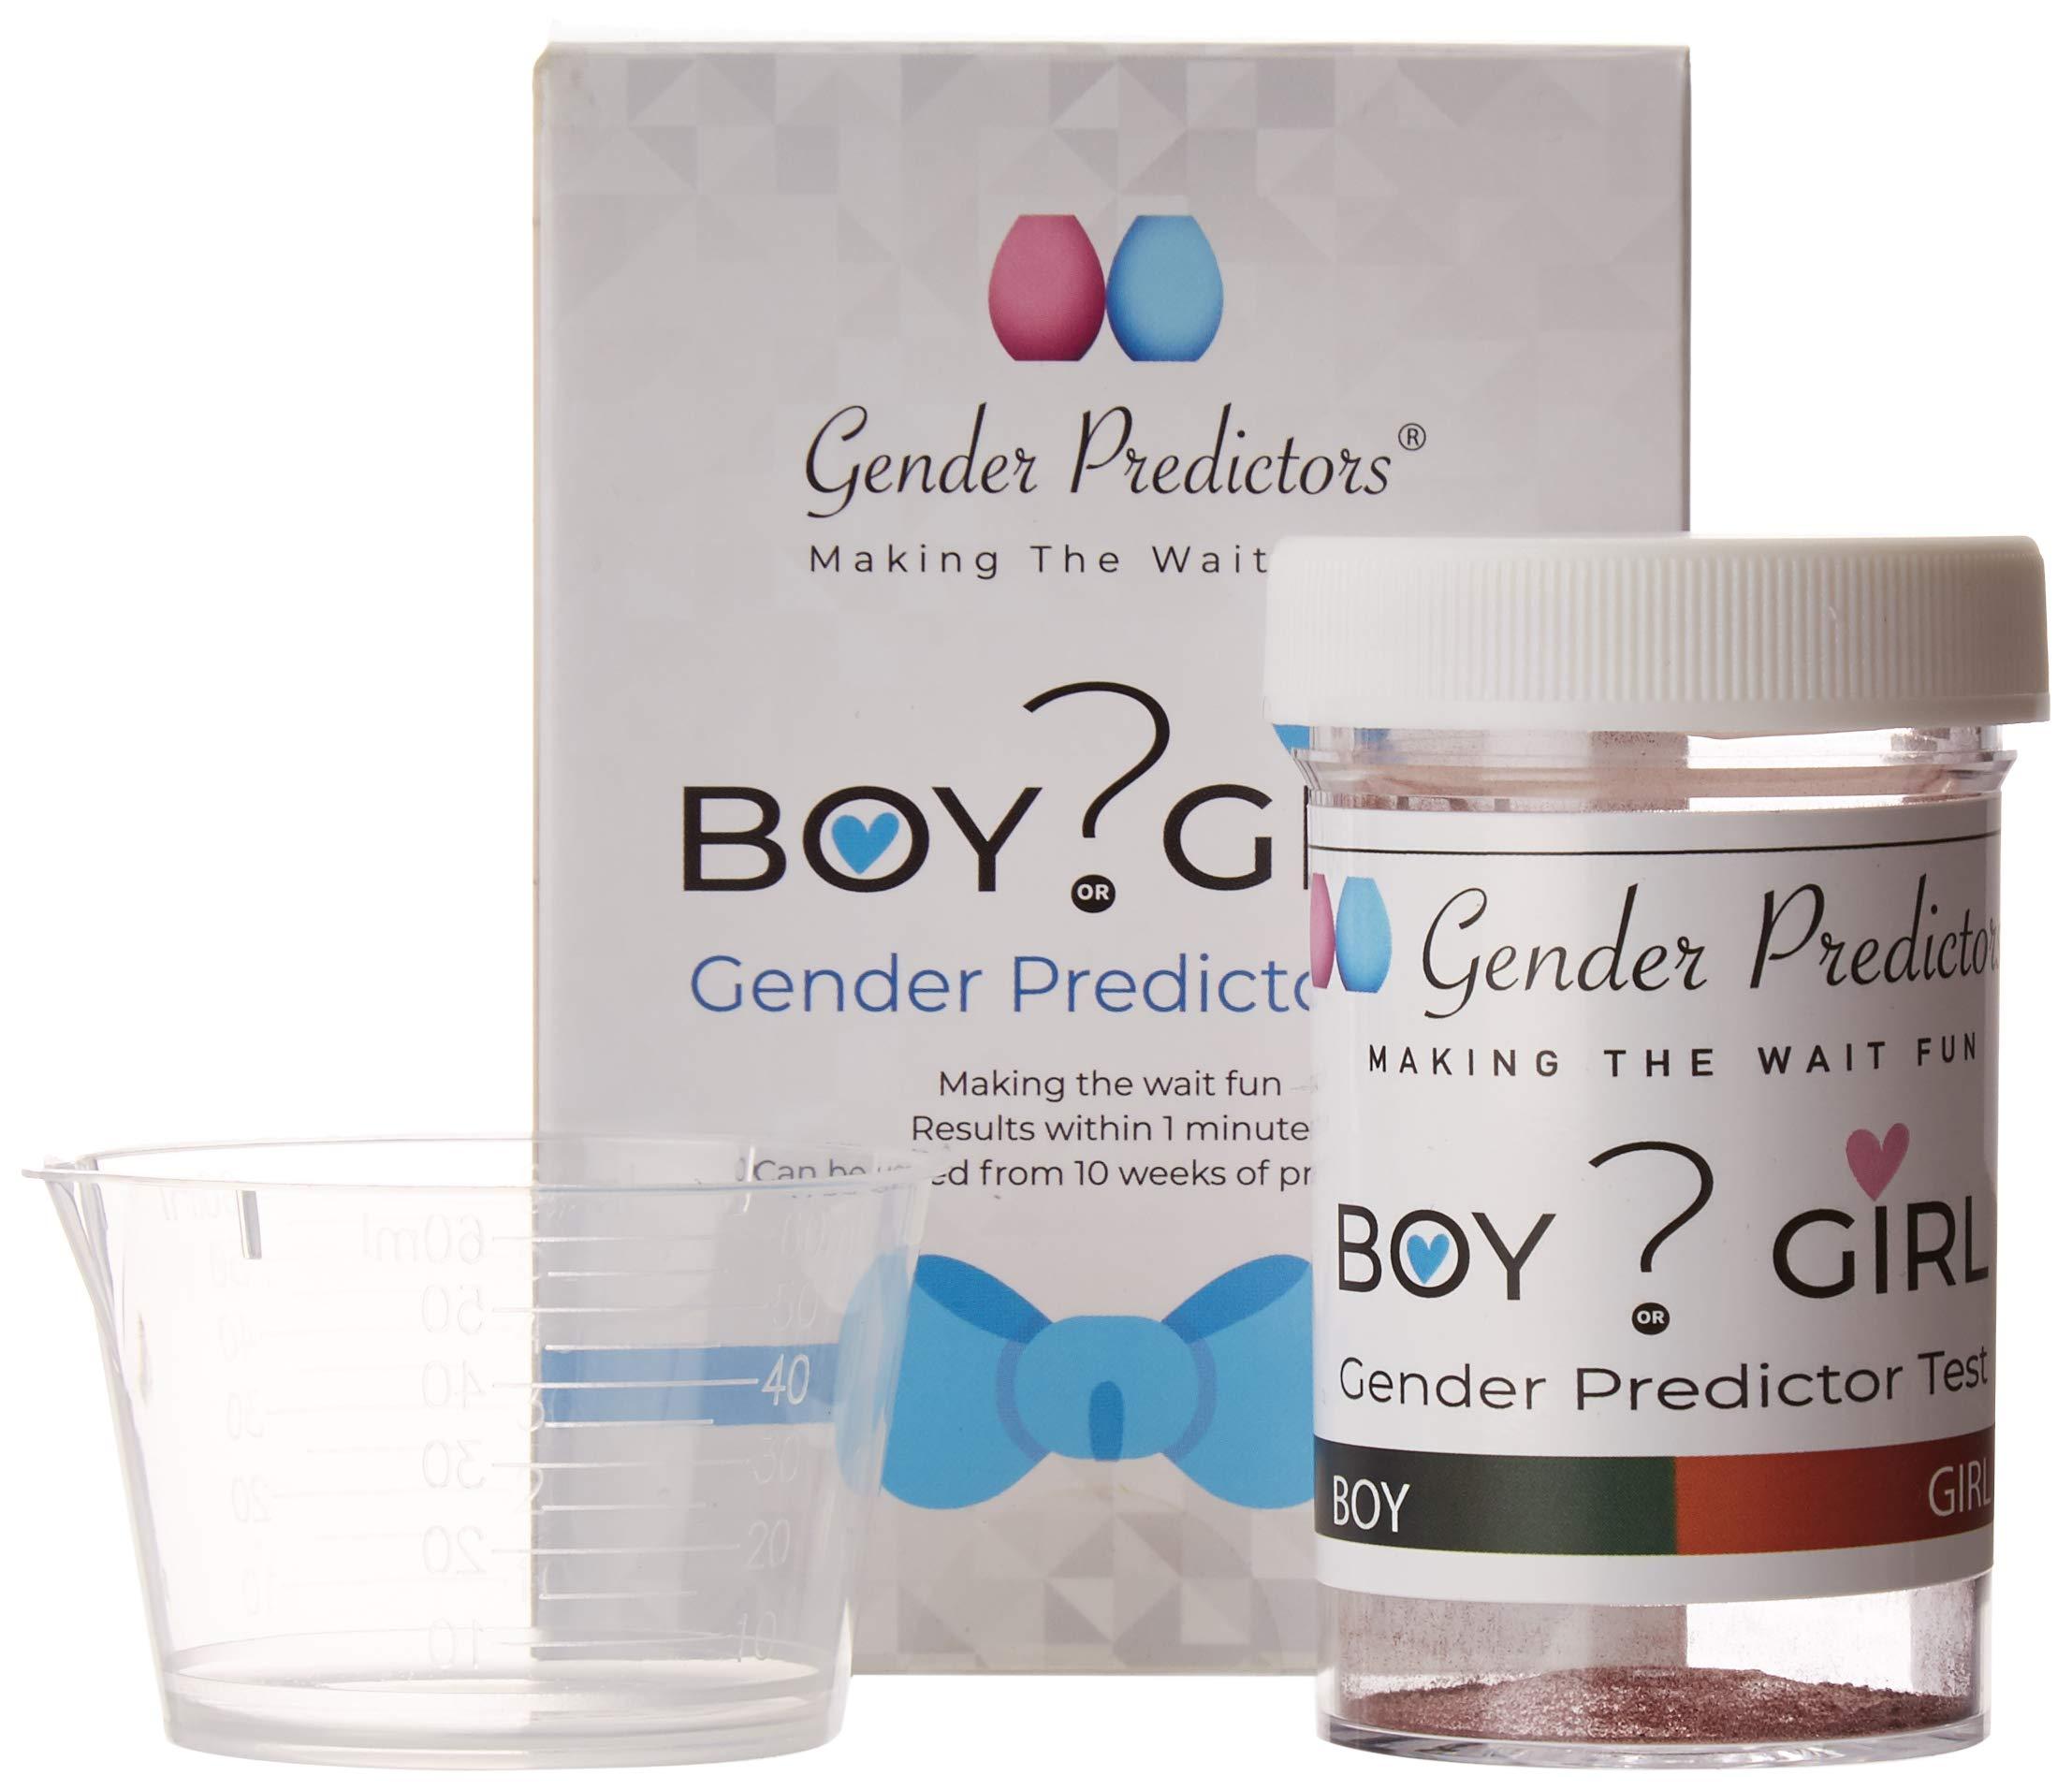 Baby Gender Predictor Test - Boy or Girl Baby Gender